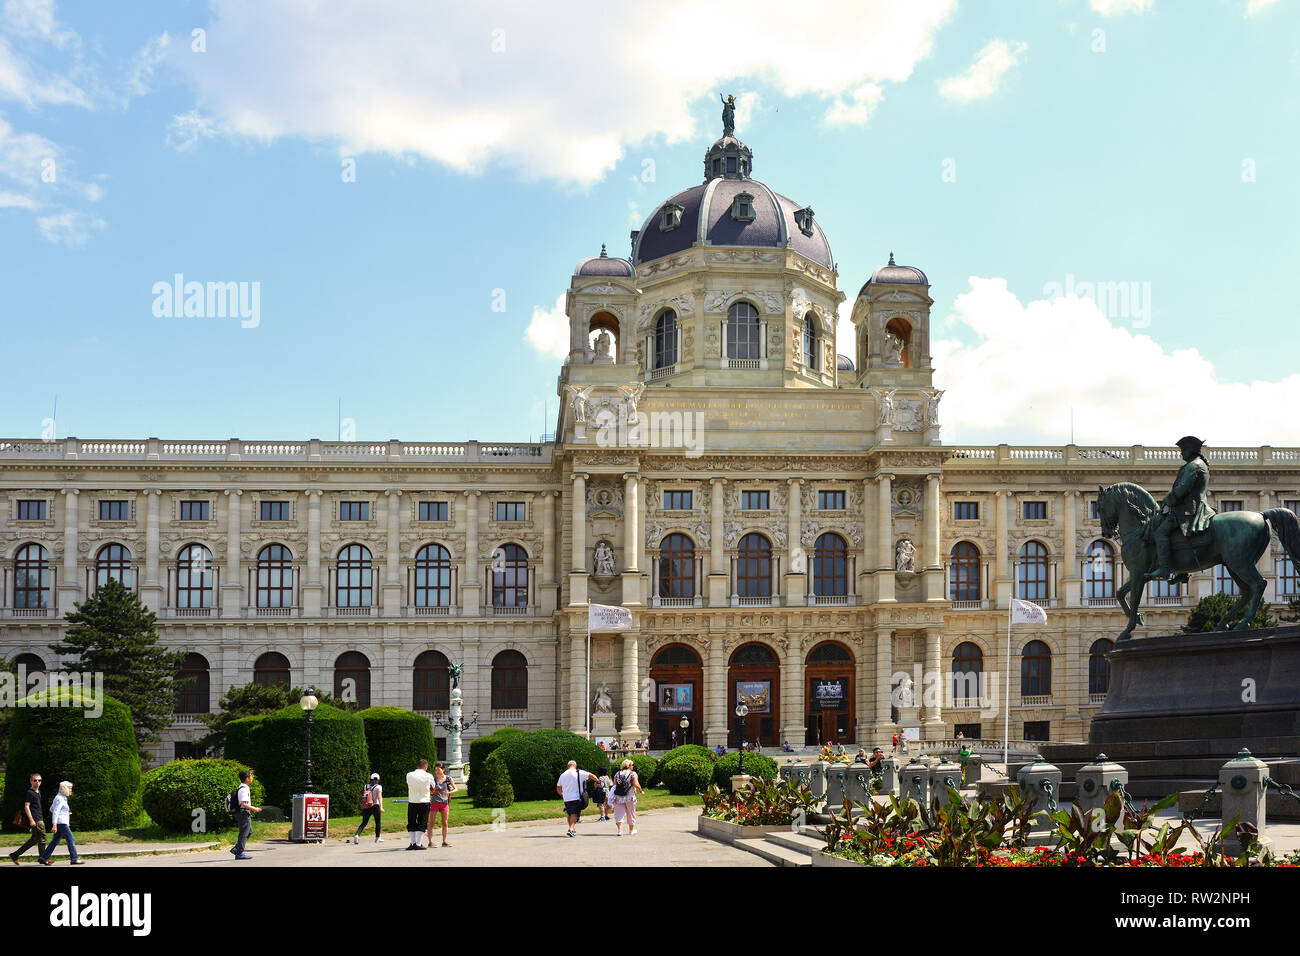 Museum of Art History on the Maria-Theresien-Platz in Vienna - Austria. Stock Photo